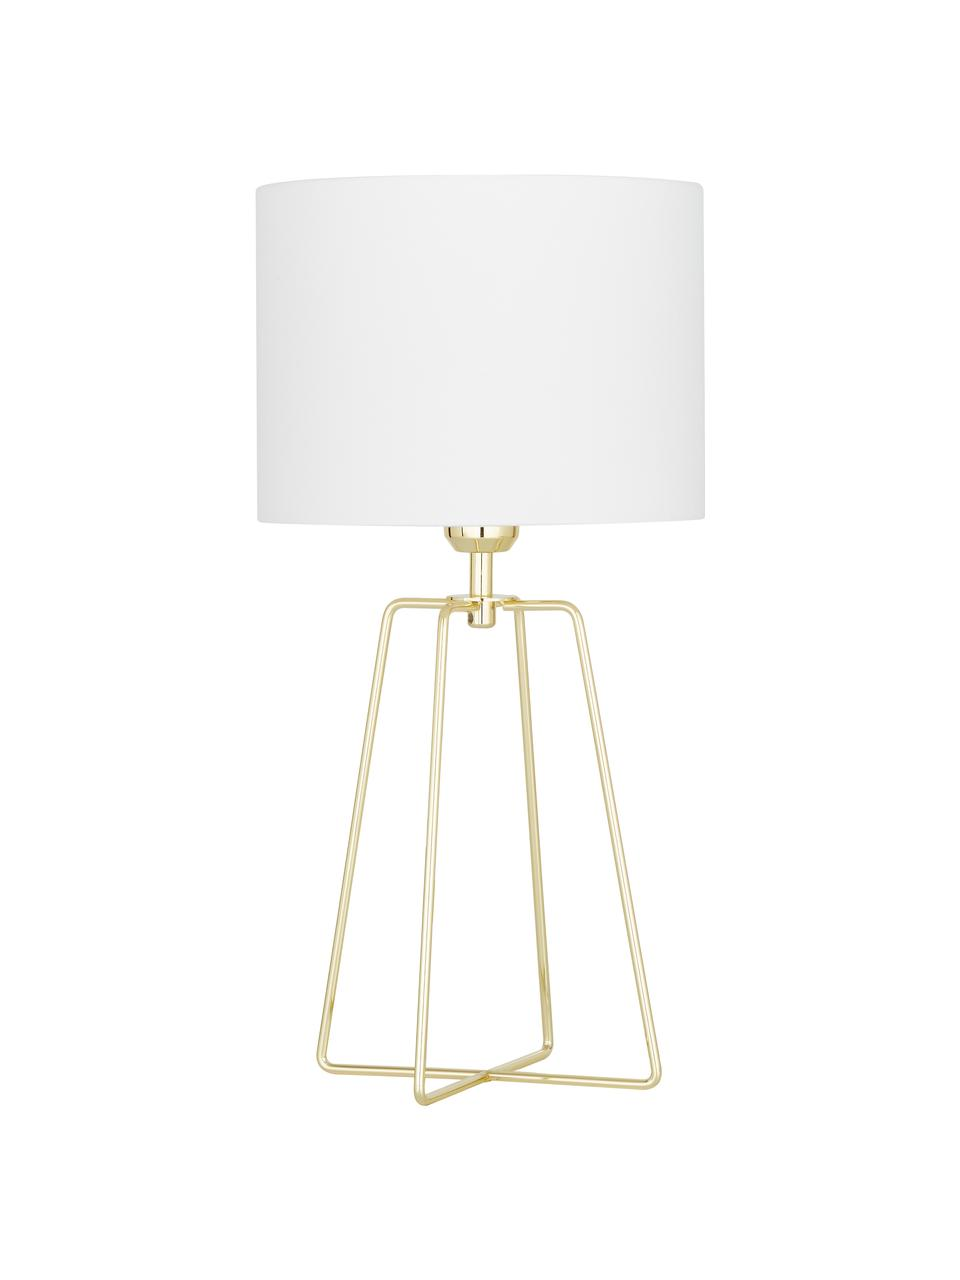 Lampe à poser blanc or Karolina, Abat-jour: blanc Pied de lampe: laiton, brillantCâble: transparent